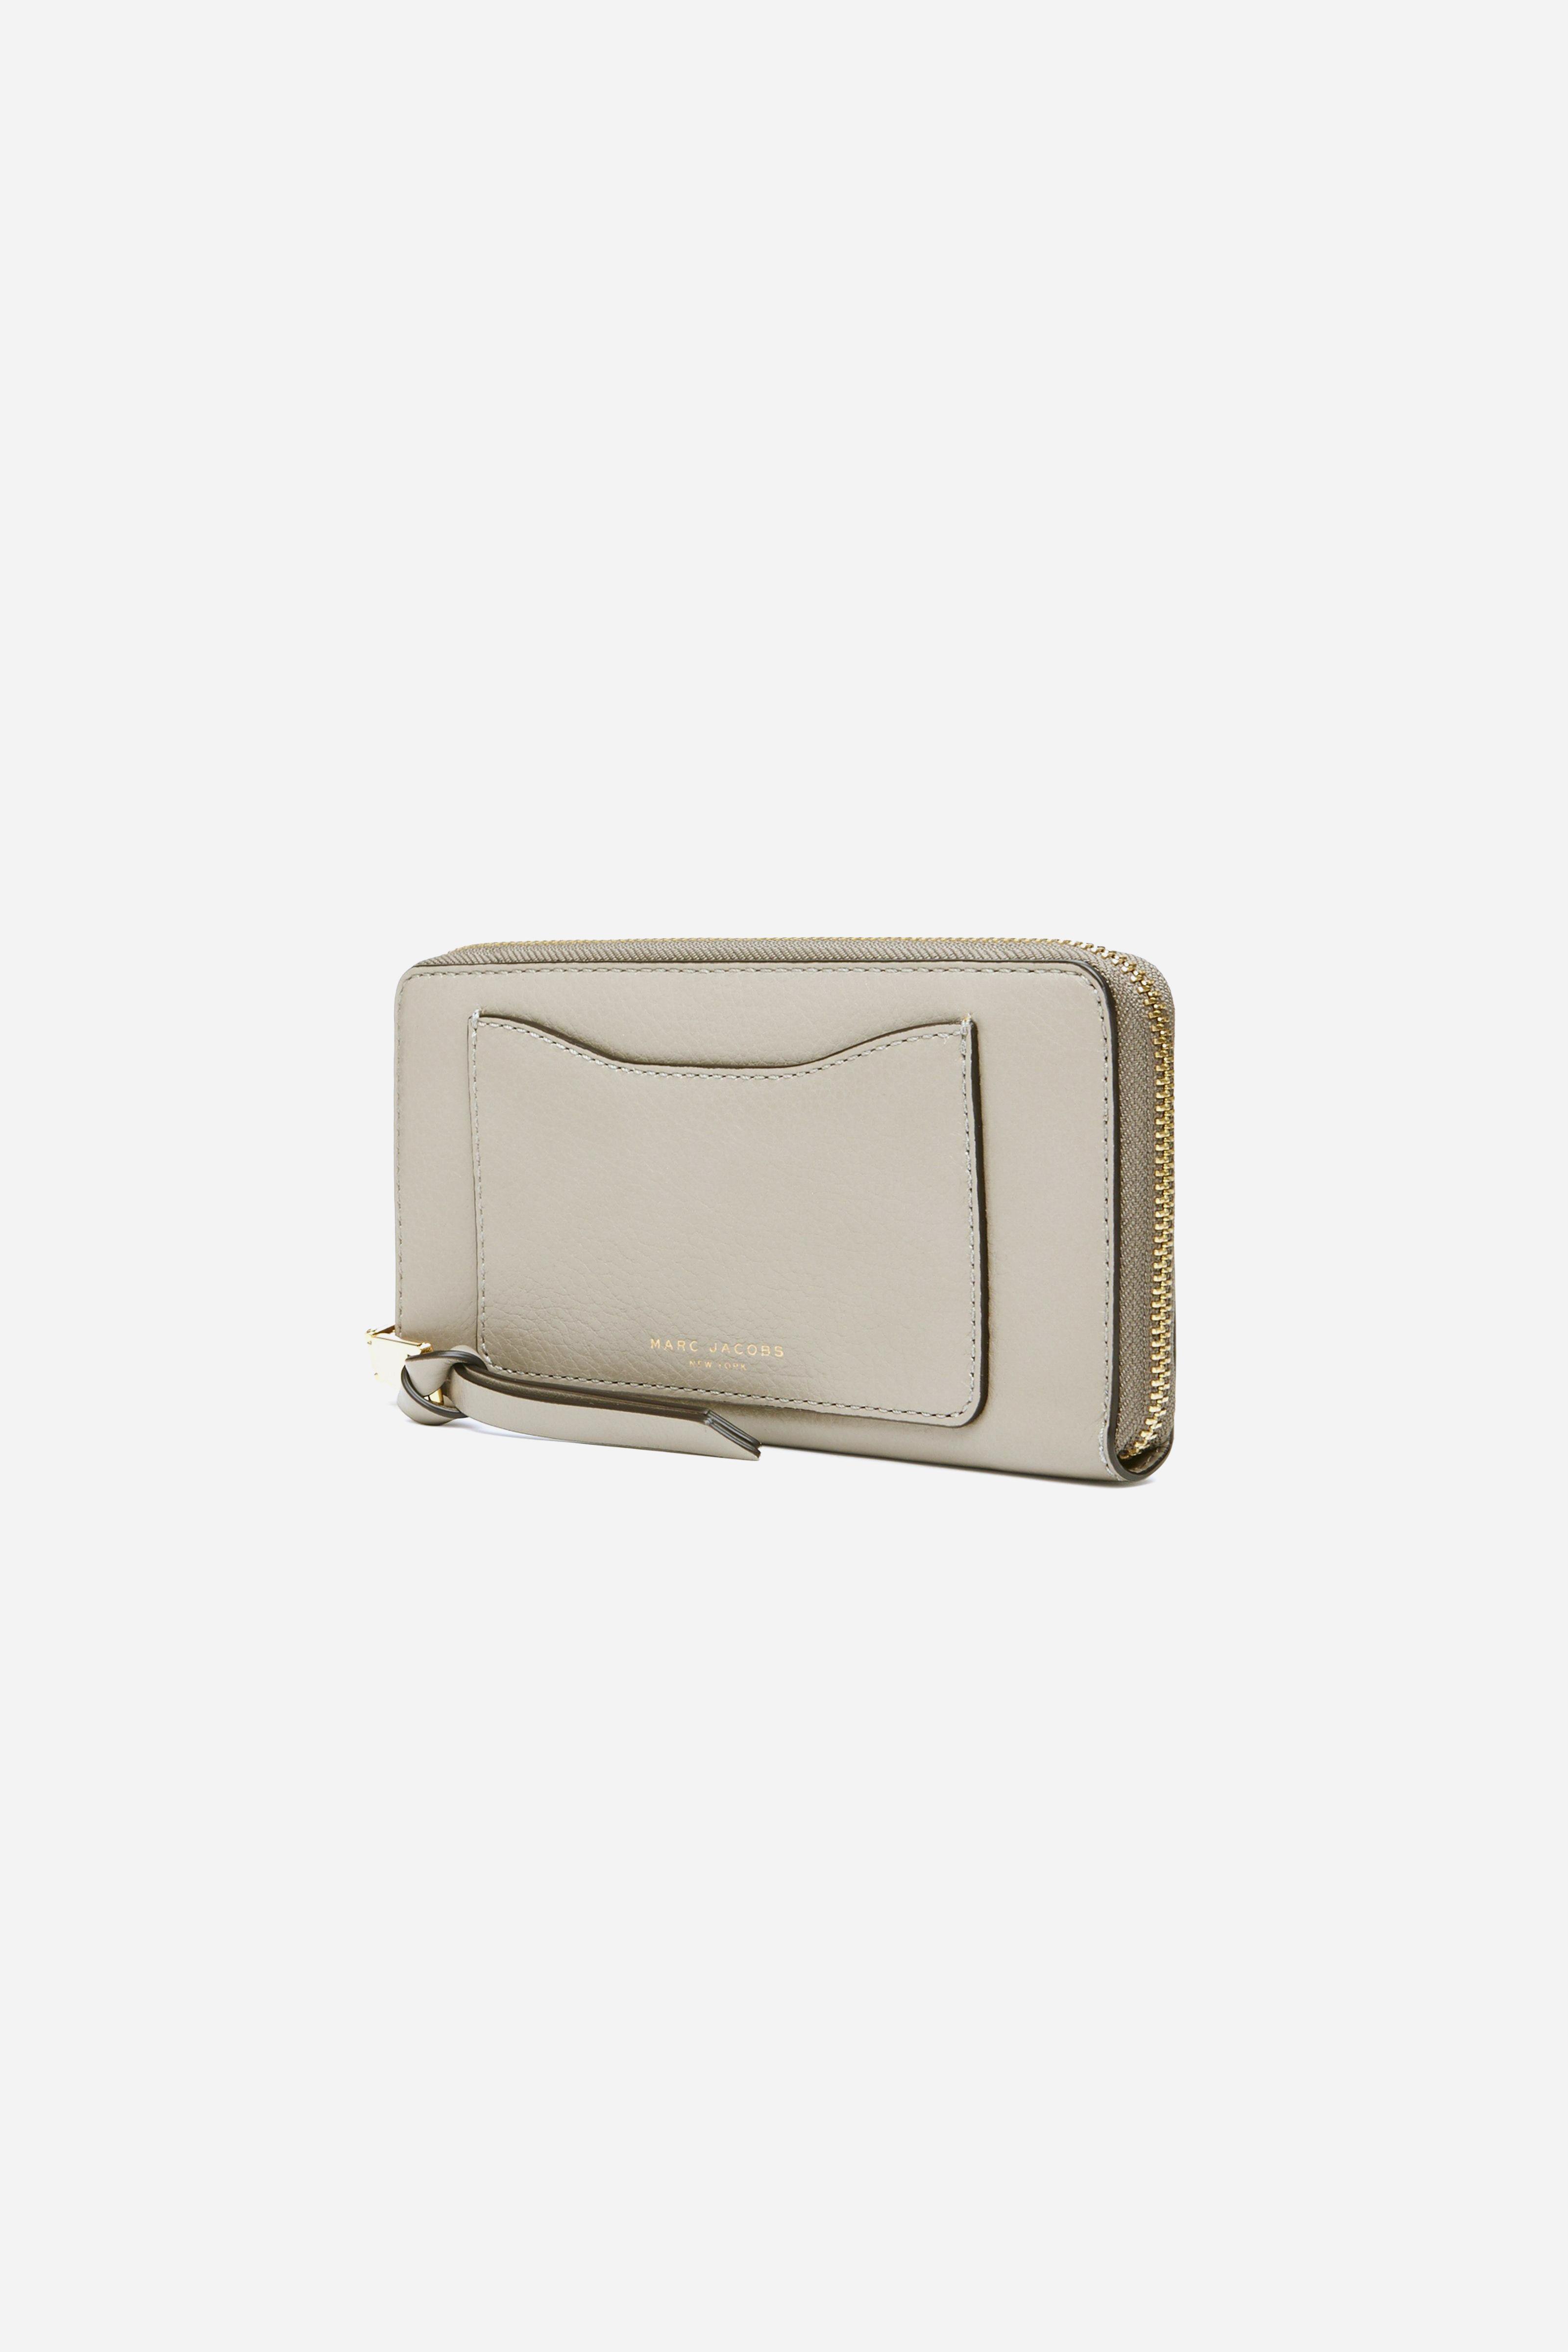 Marc Jacobs 34 - Recruit Continental Wallet - Mink